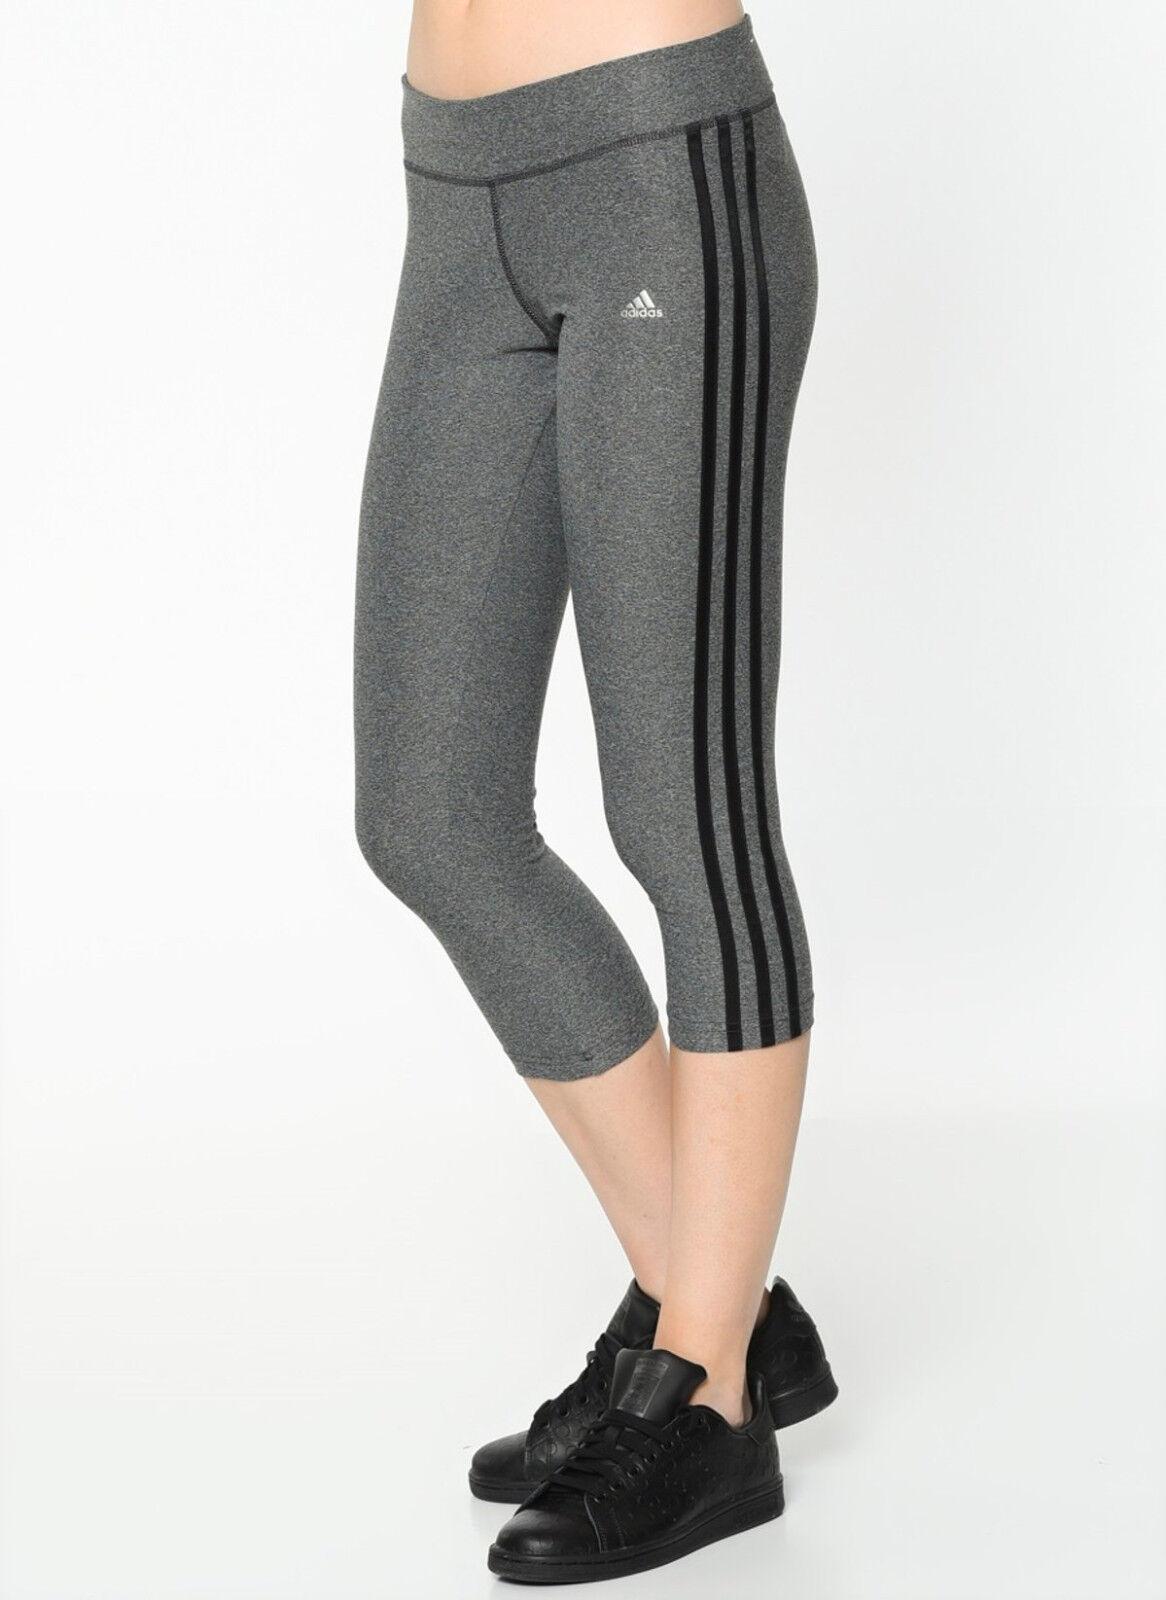 Women Adidas Ultimate 3/4 3 Stripe Tights Climalite Grey Wor